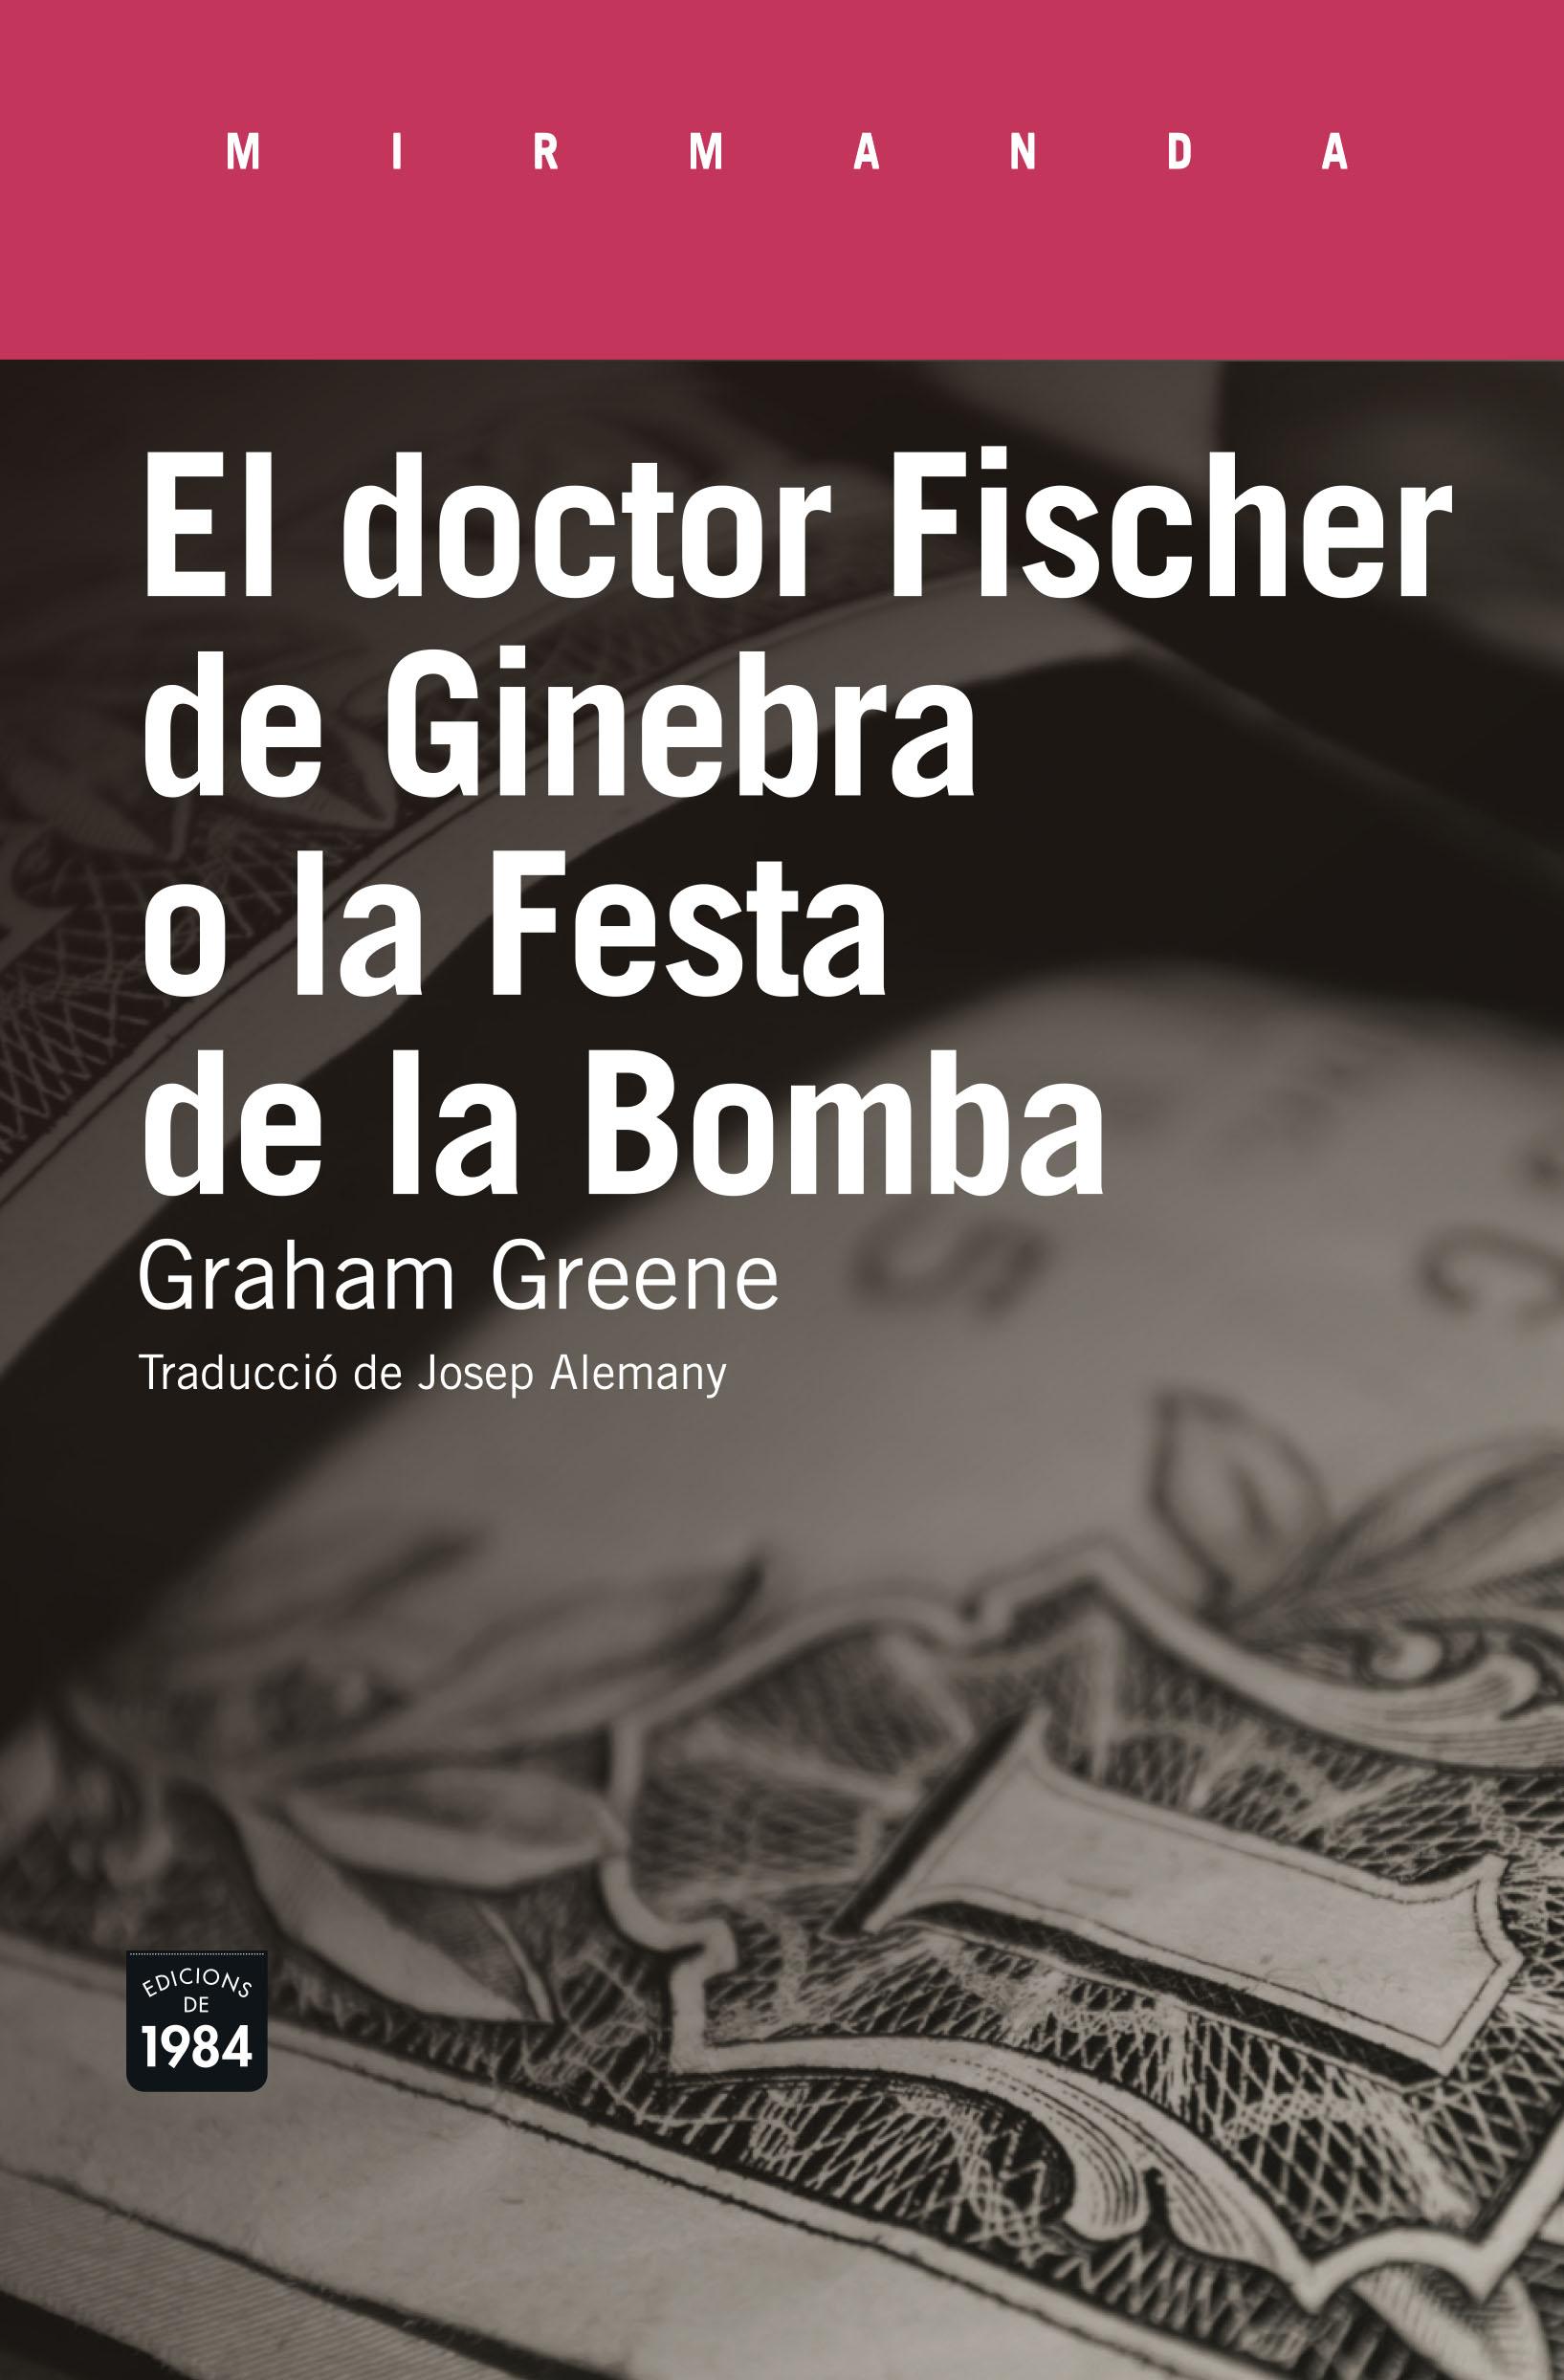 El doctor Fischer de Ginebra o la Festa de la Bomba